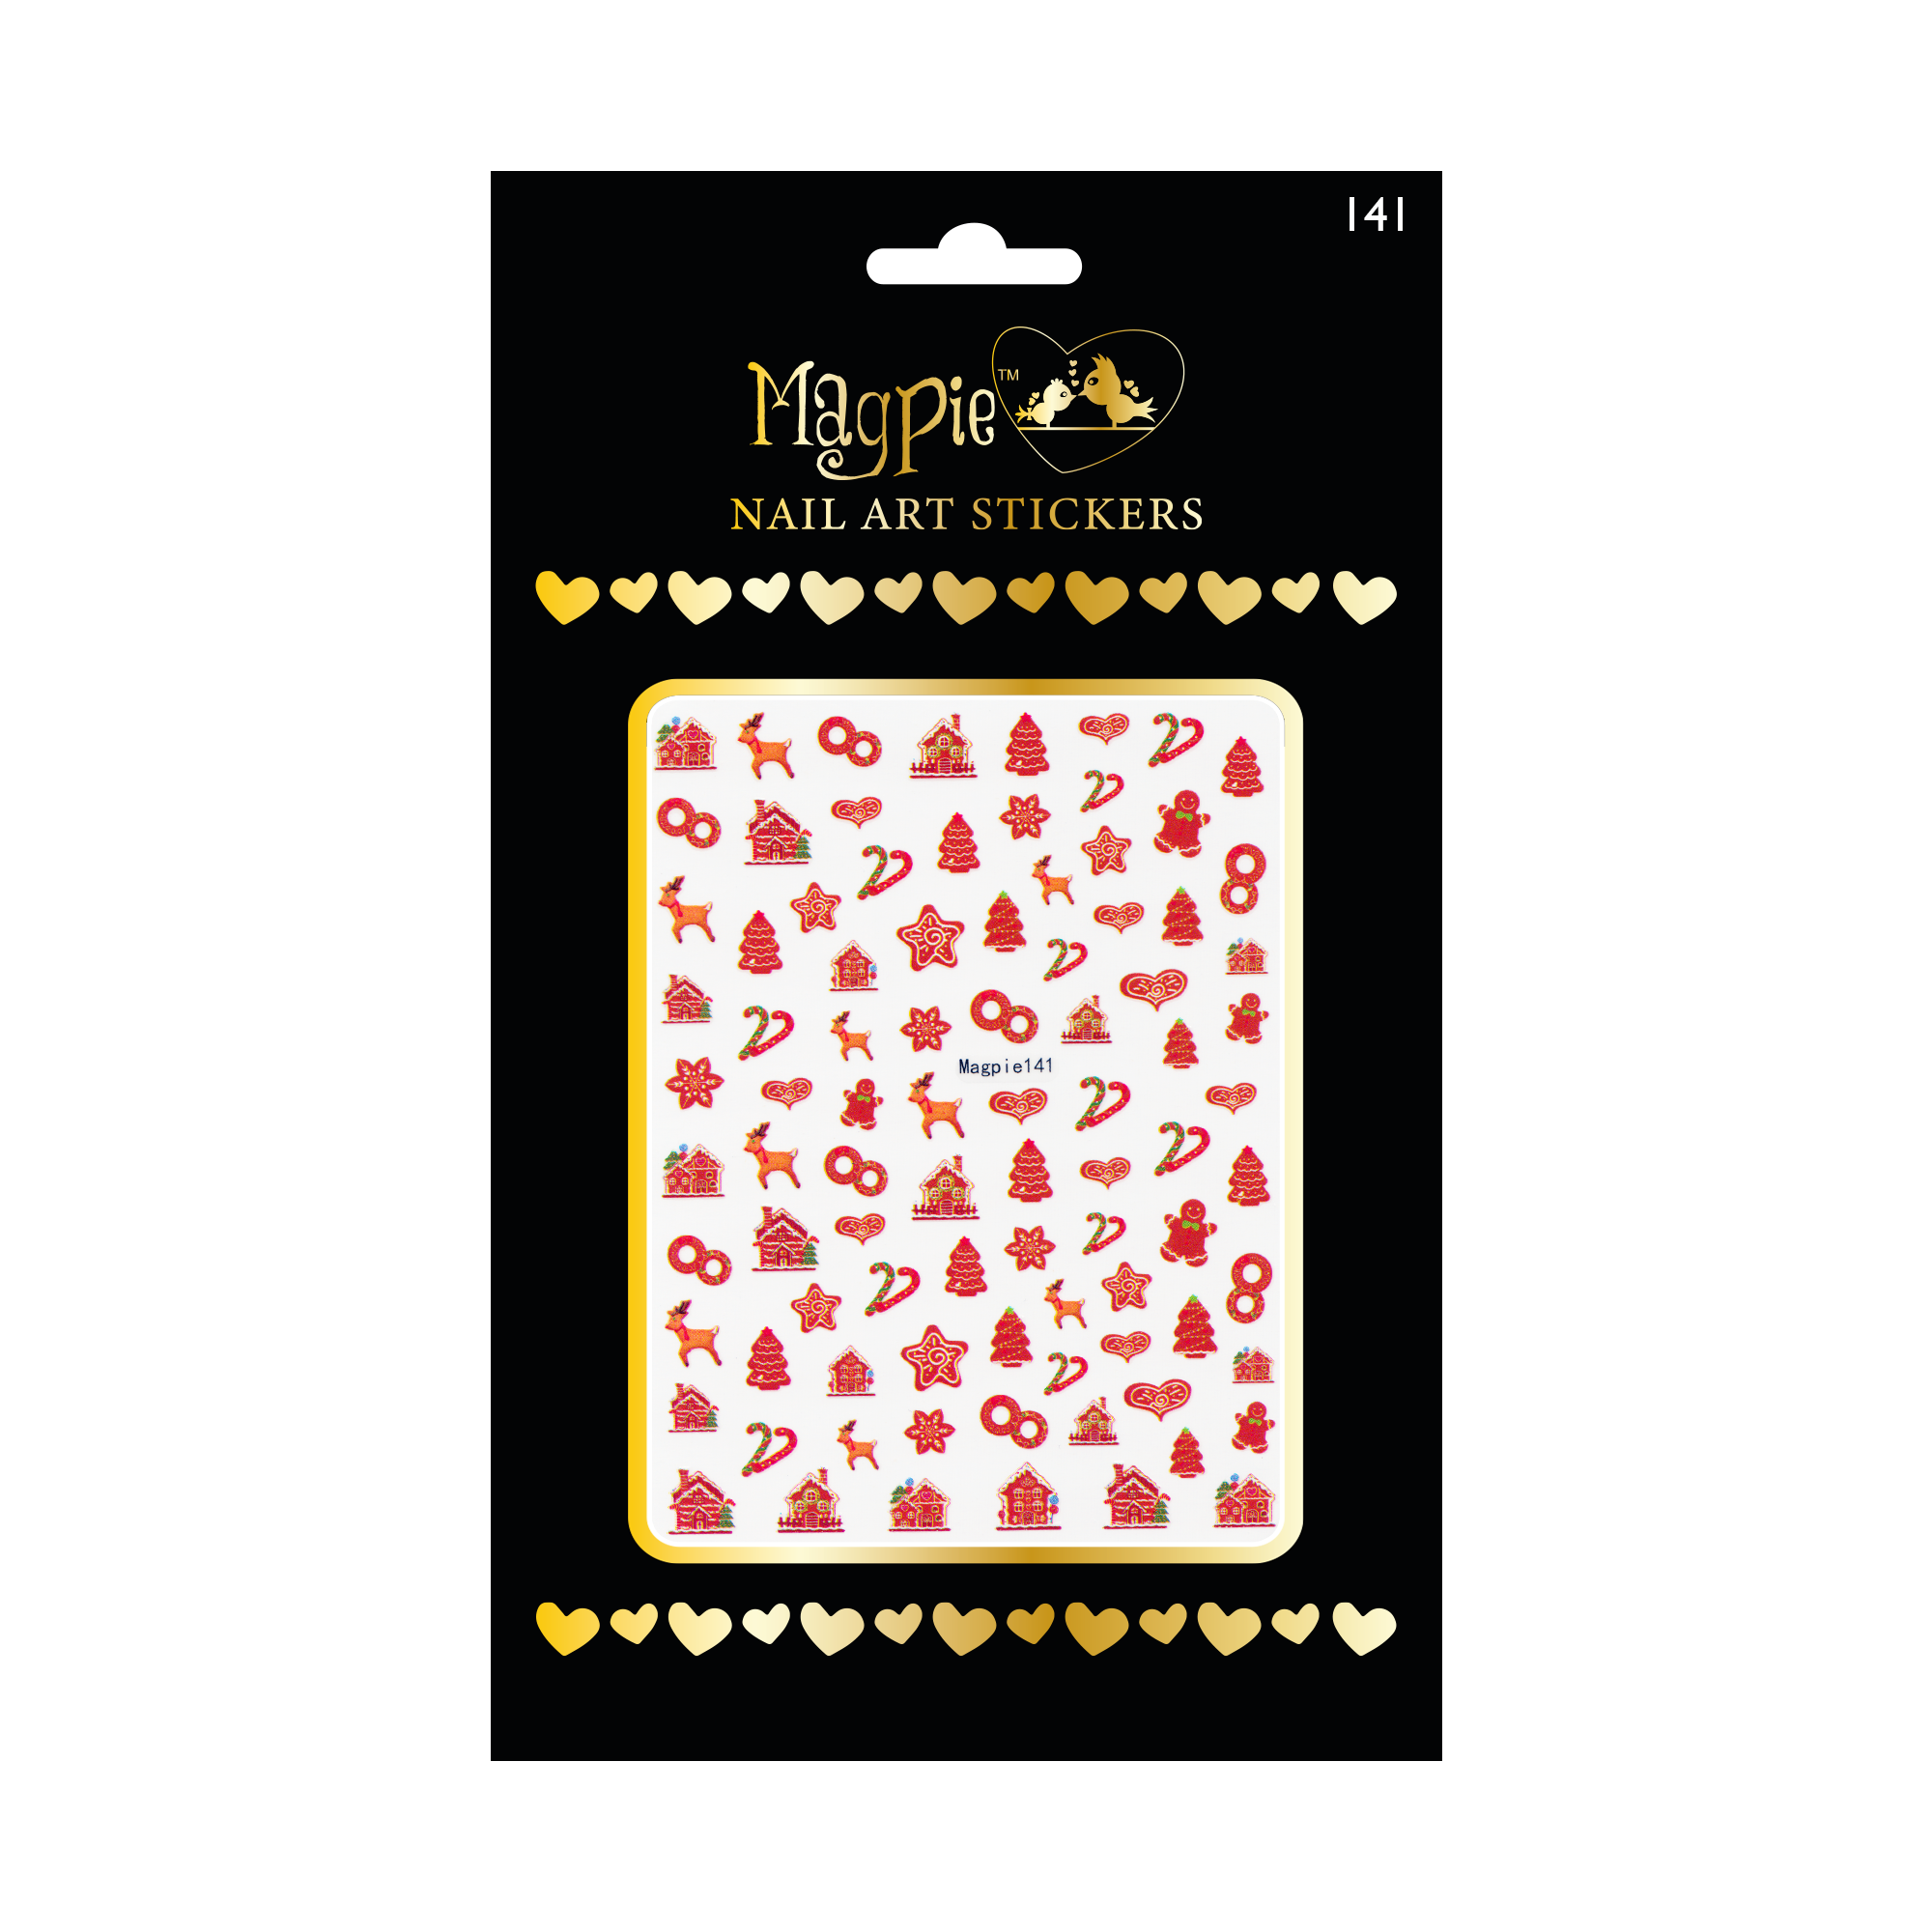 Magpie 141 stickers